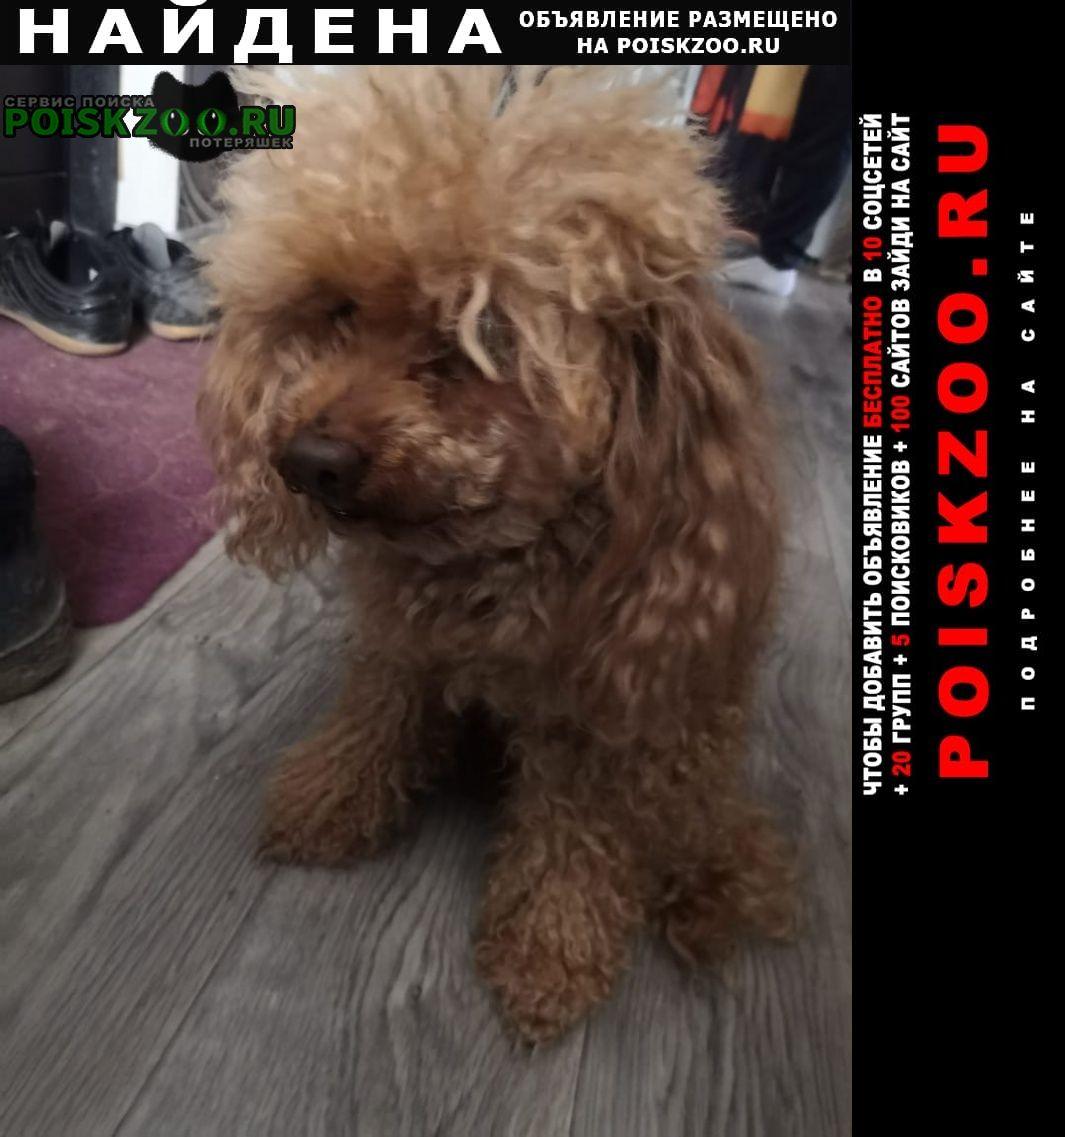 Найдена собака кобель красноармейский р-он Волгоград